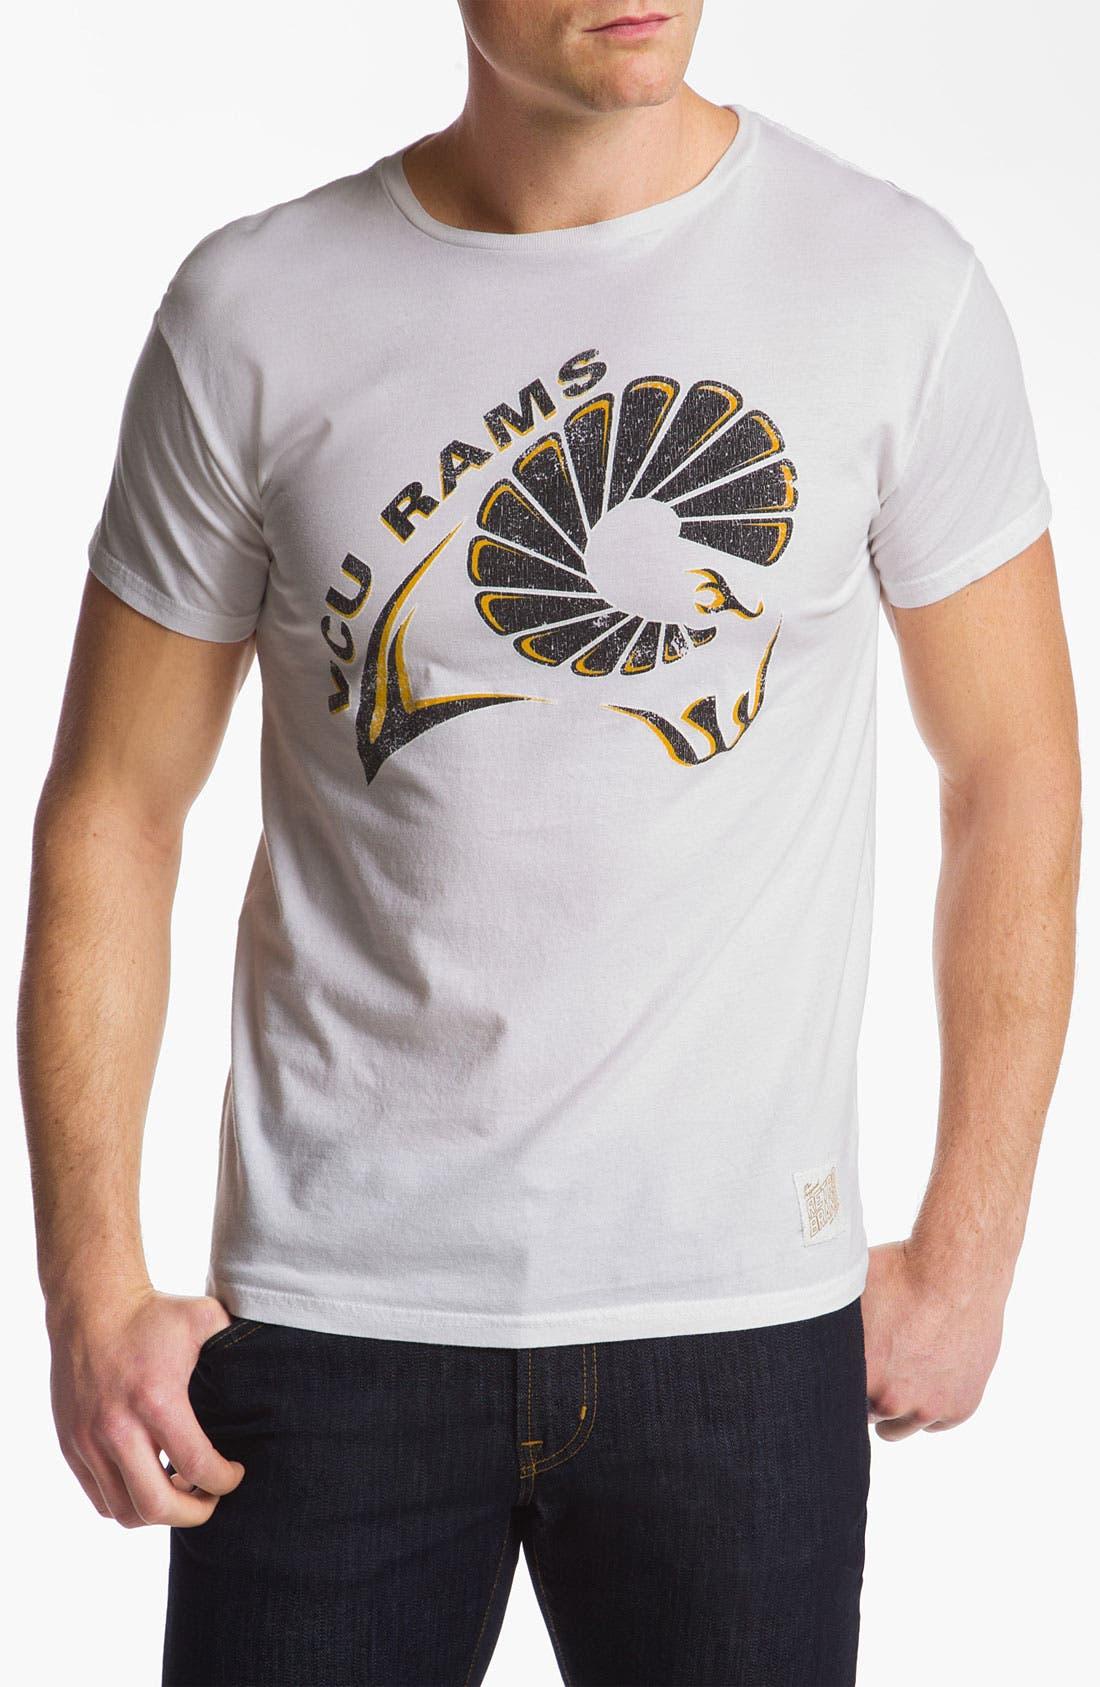 Main Image - The Original Retro Brand 'Virginia Commonwealth Rams' T-Shirt